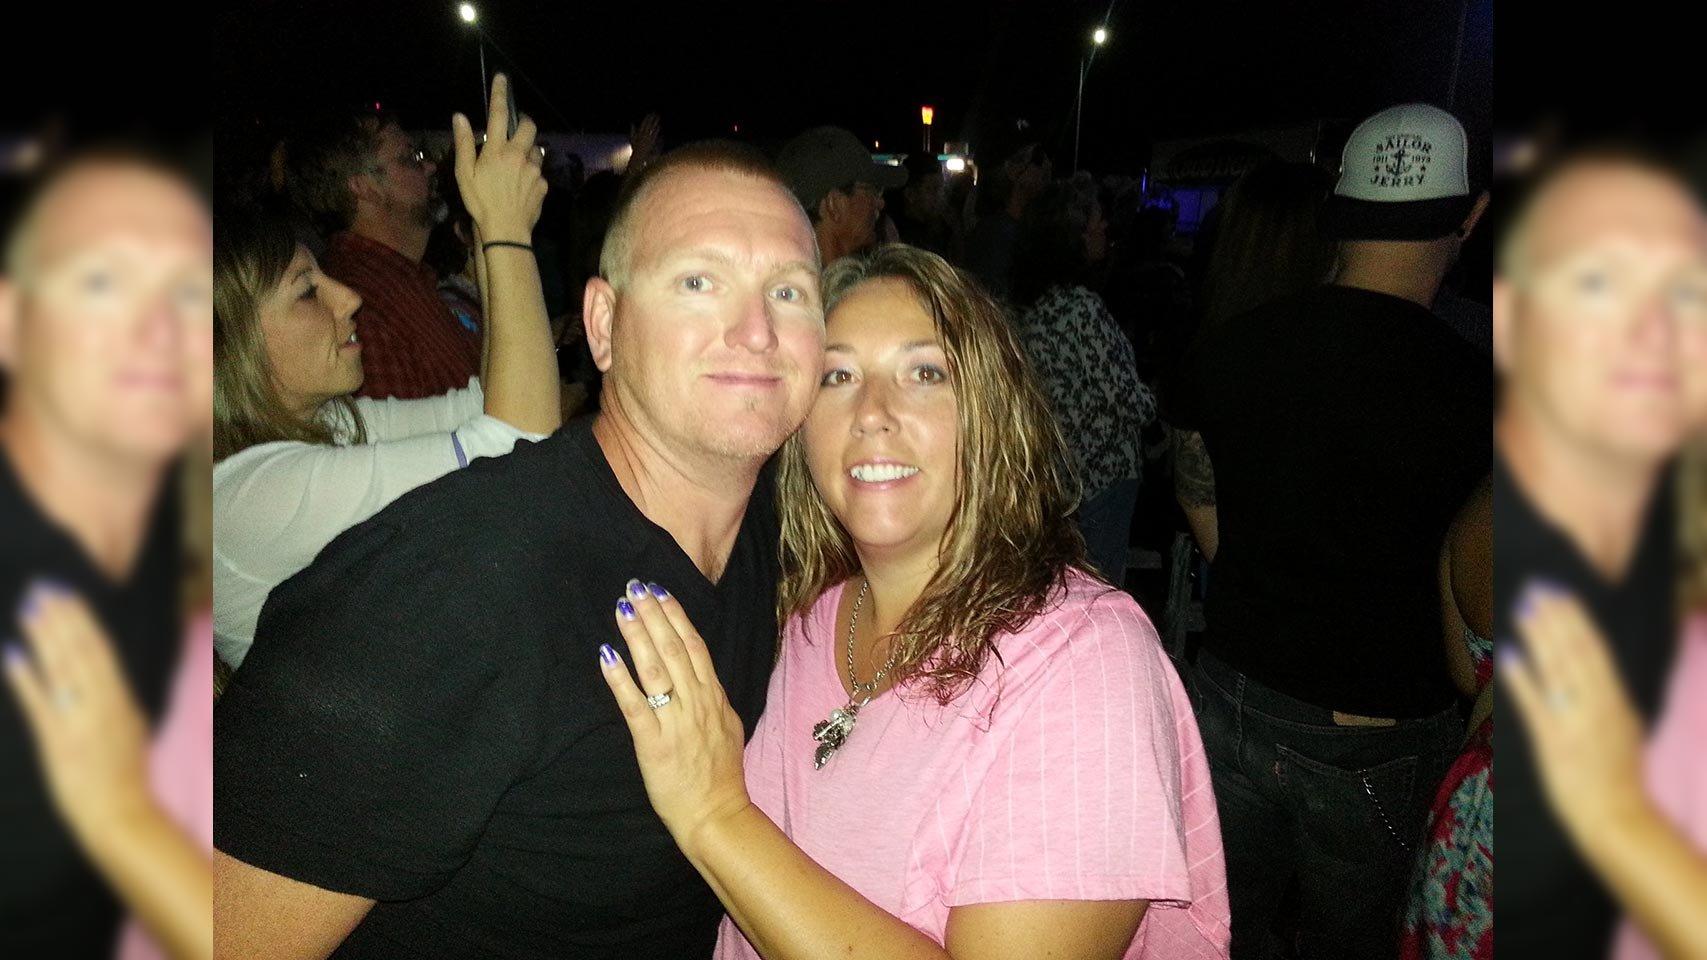 Kurt Fowler and his wife (Source: Ryan Erickson via GoFundMe)